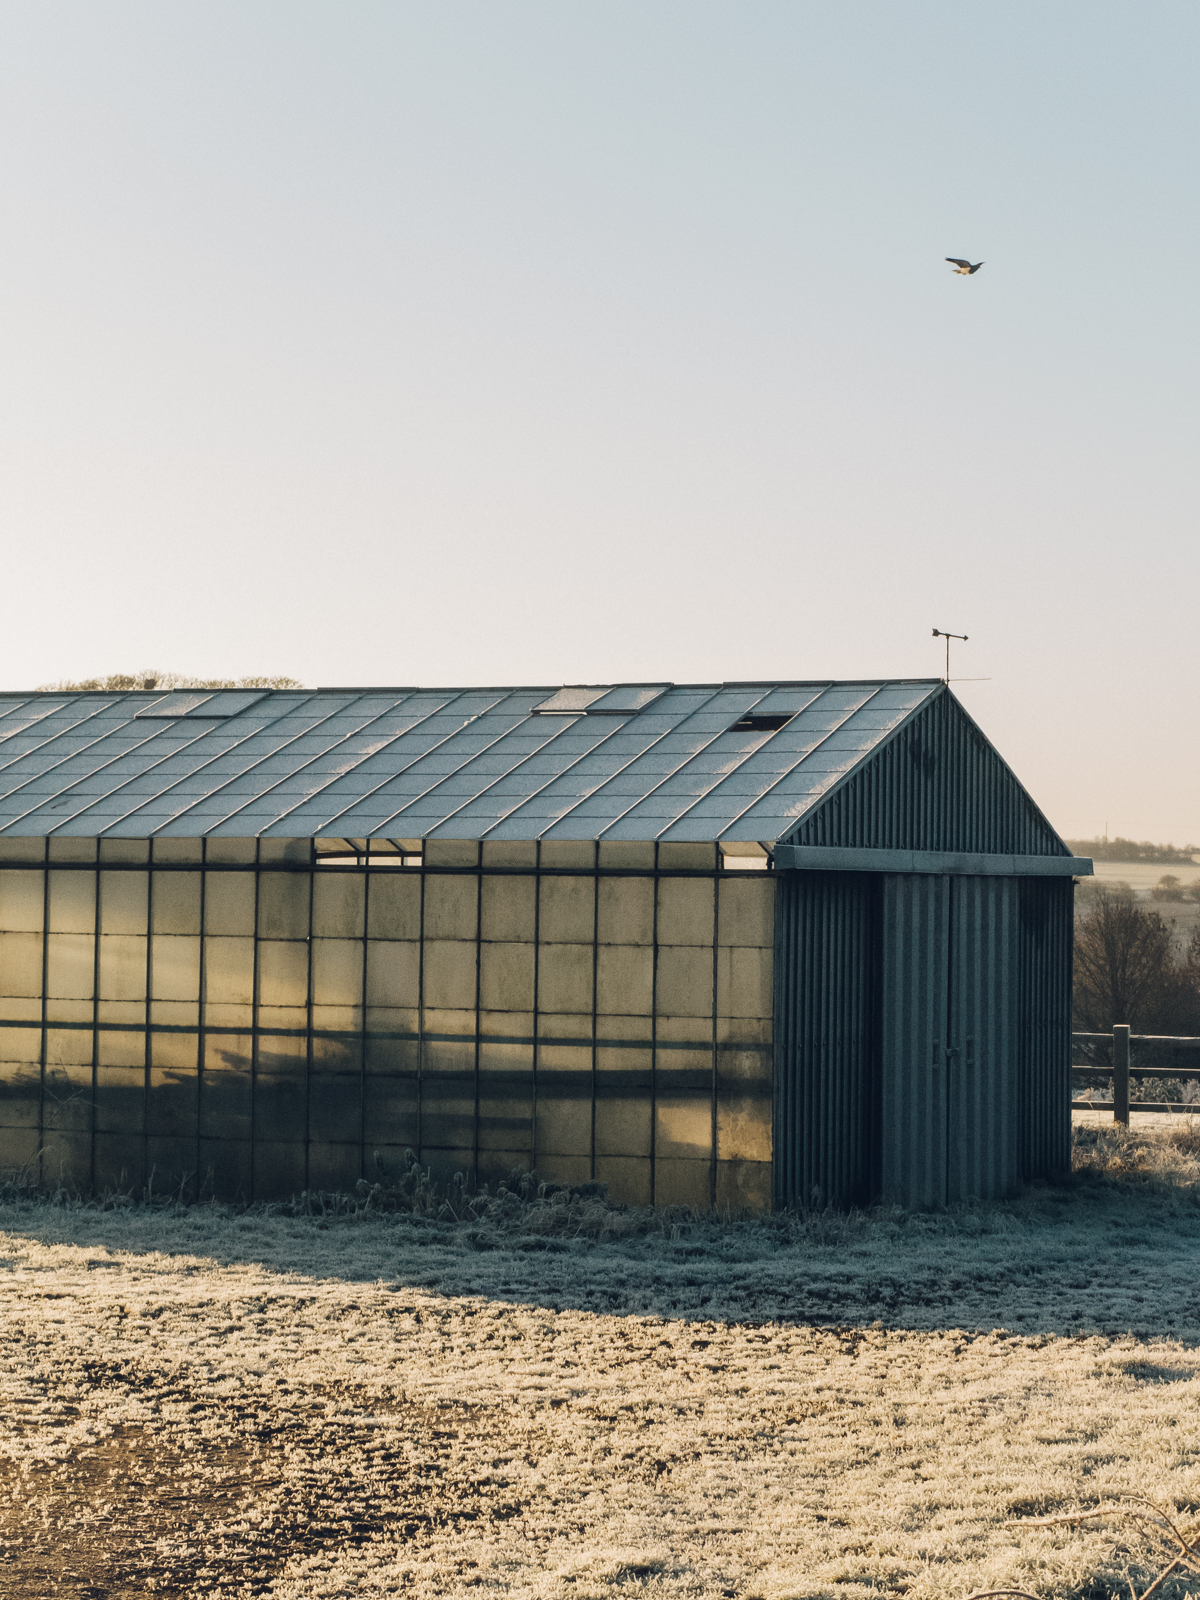 Frozen greenhouse in the Winter sunshine.